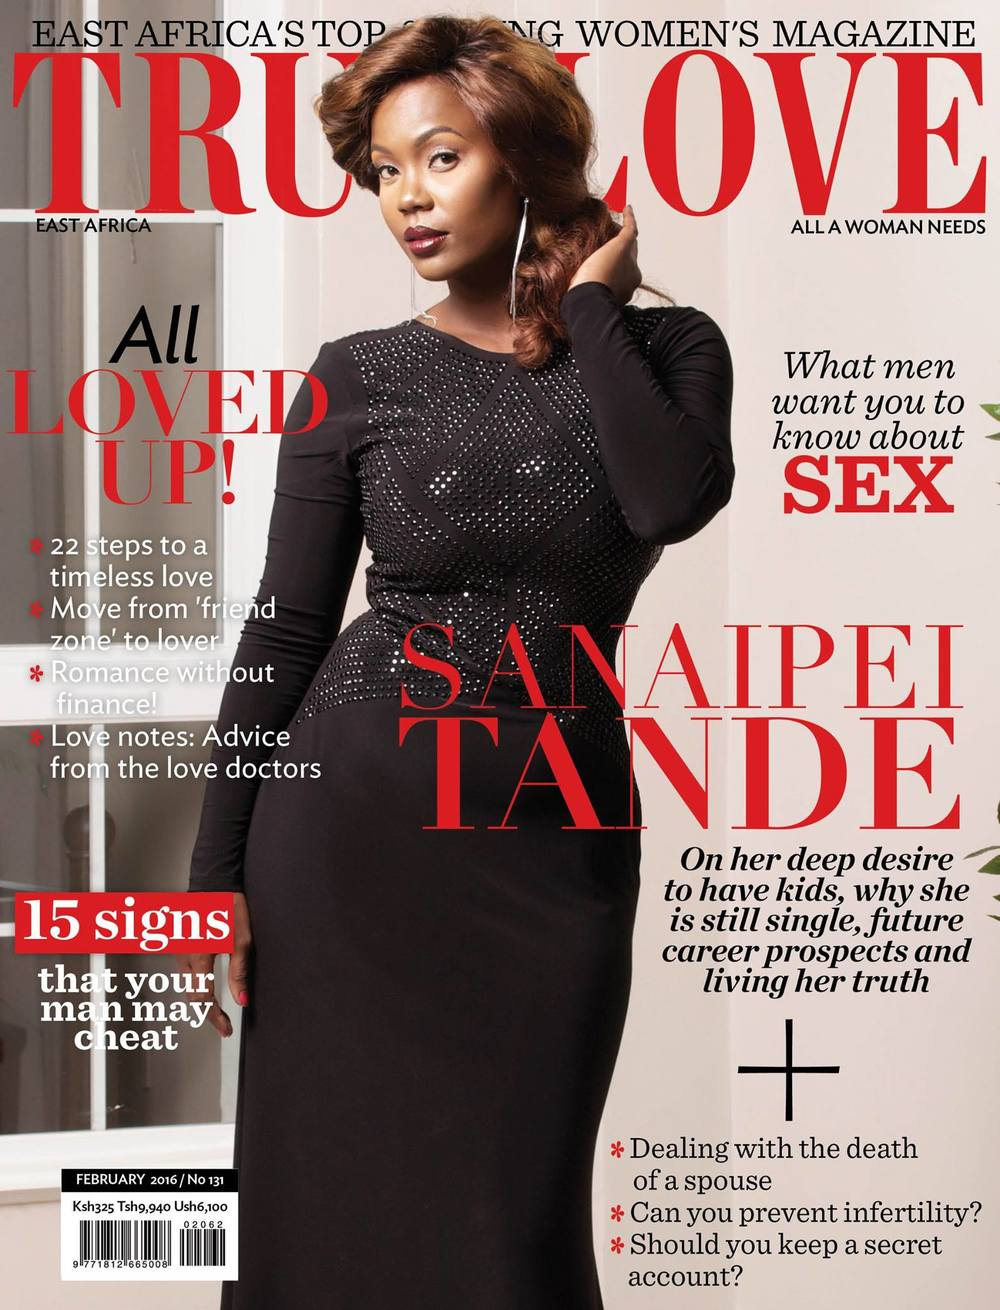 Imgae: True Love Magazine, East Africa